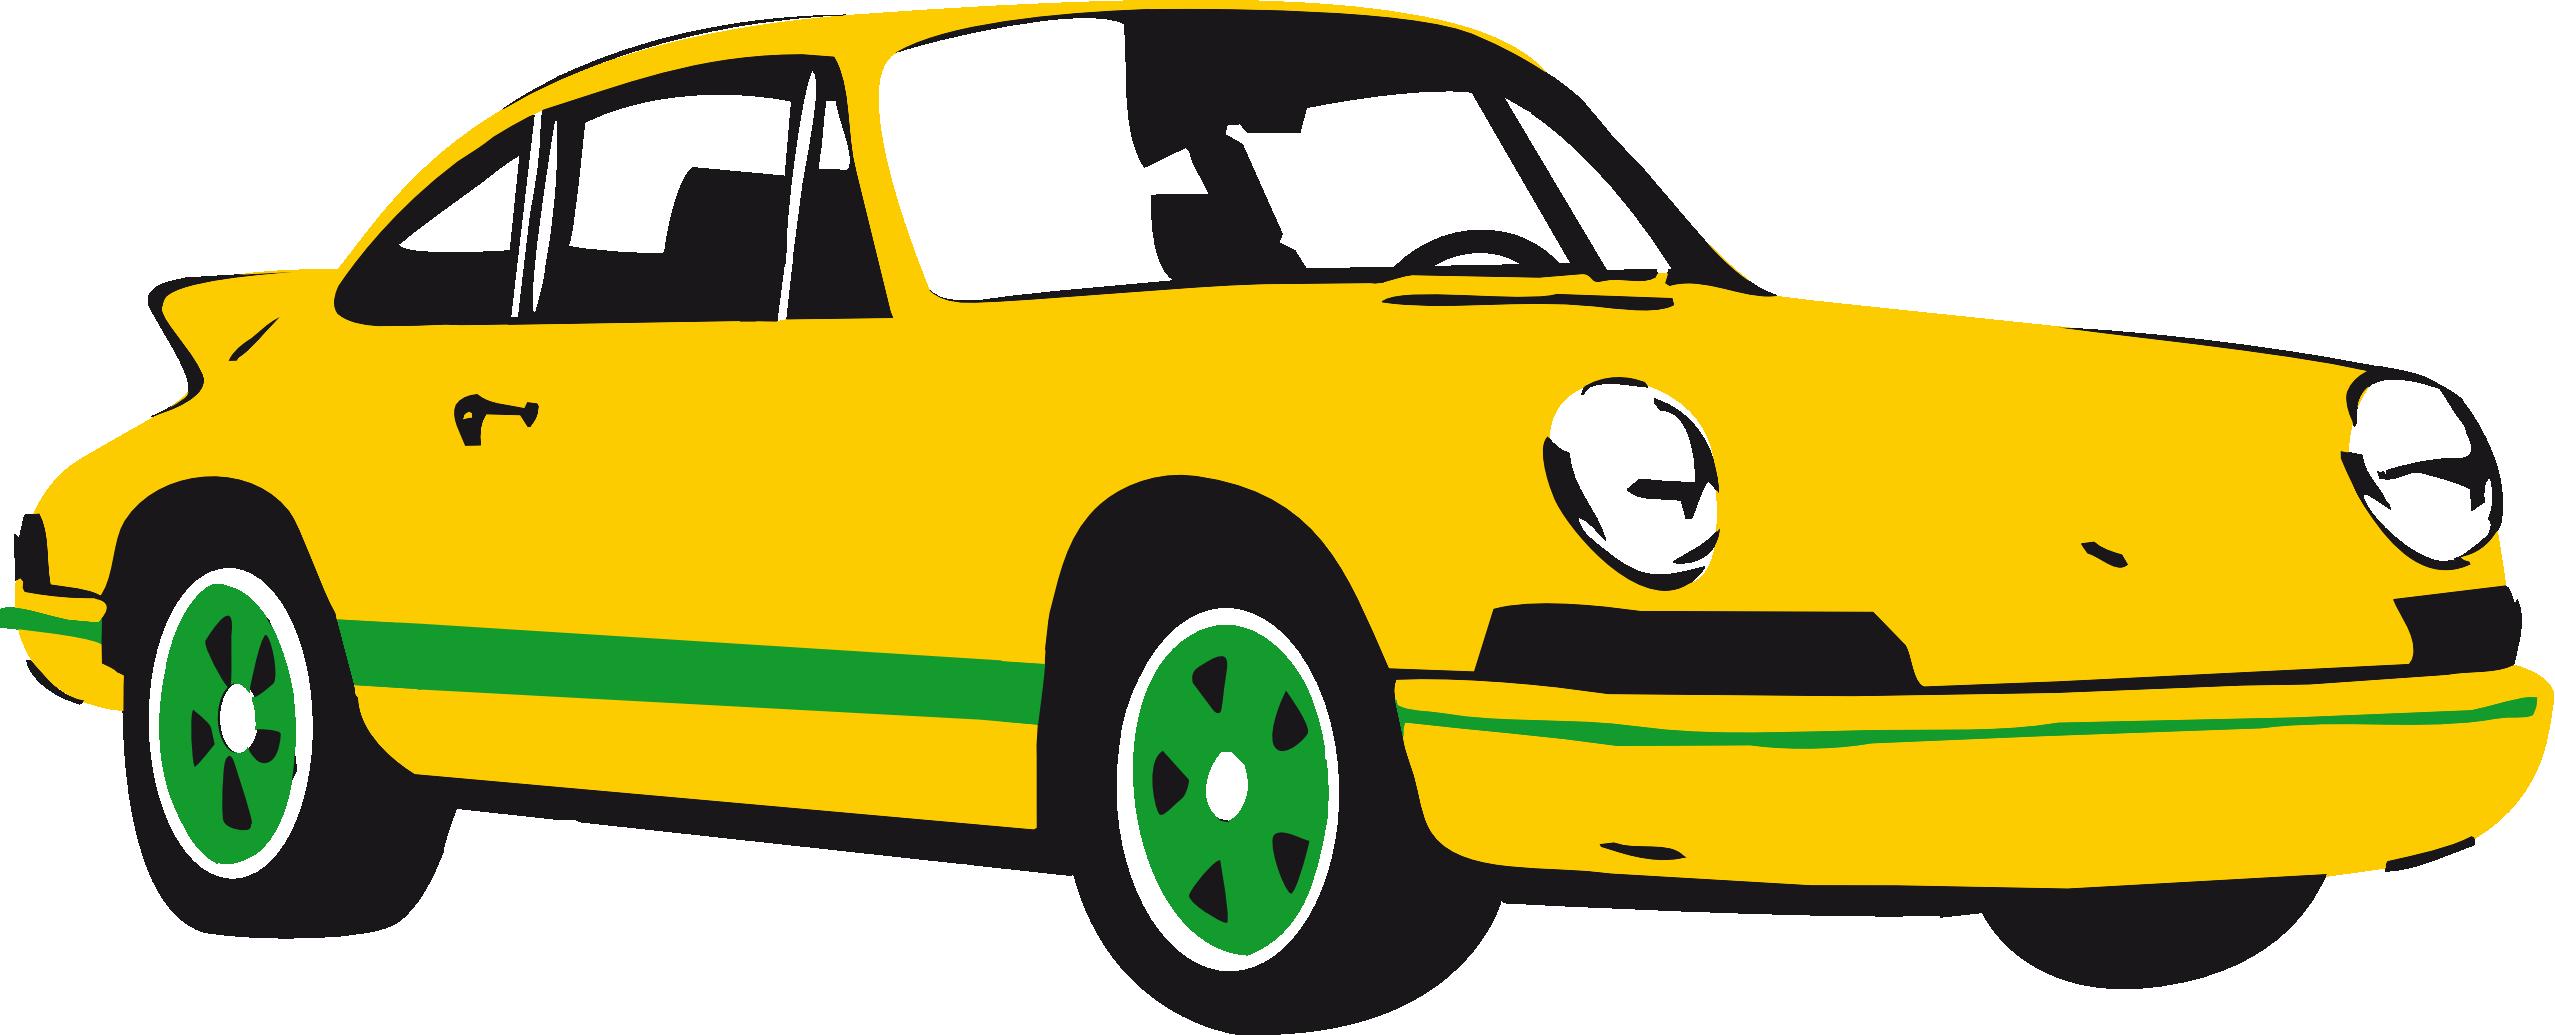 car clipart top view clipart panda free clipart images auto clip art borders auto clip art images